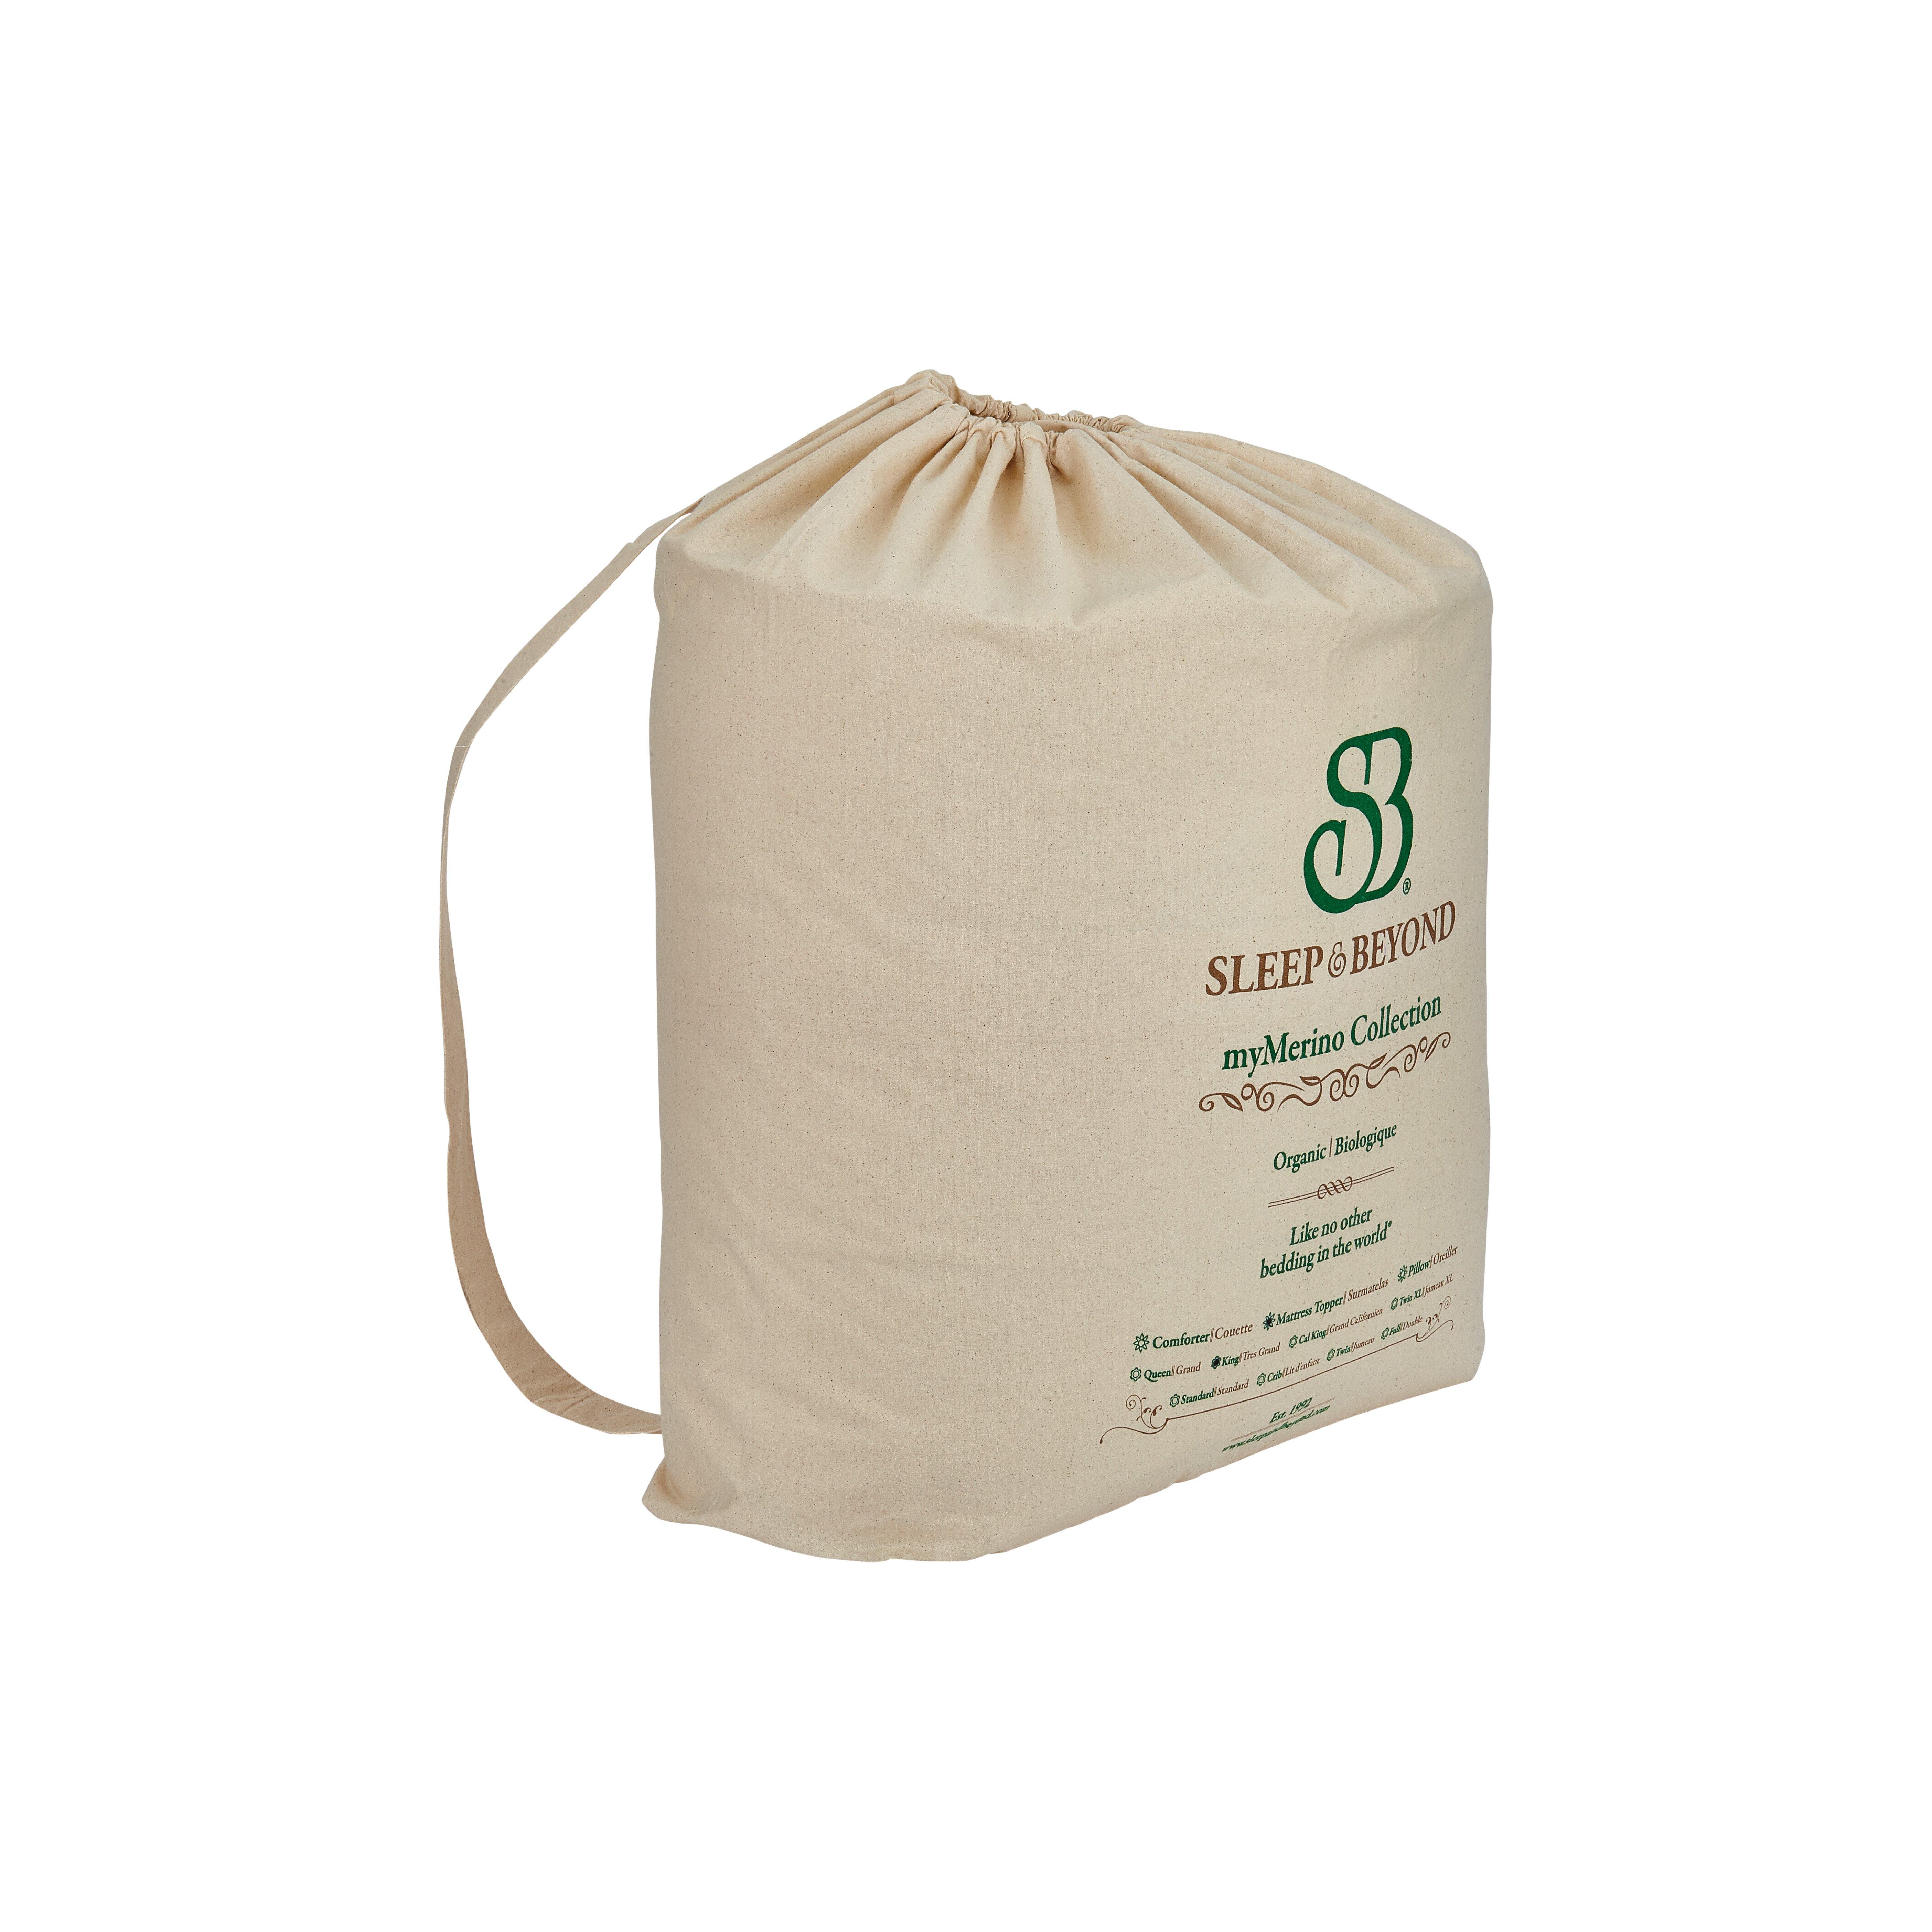 Sleep amp beyond organic merino wool mattress topper amp reviews wayfair ca